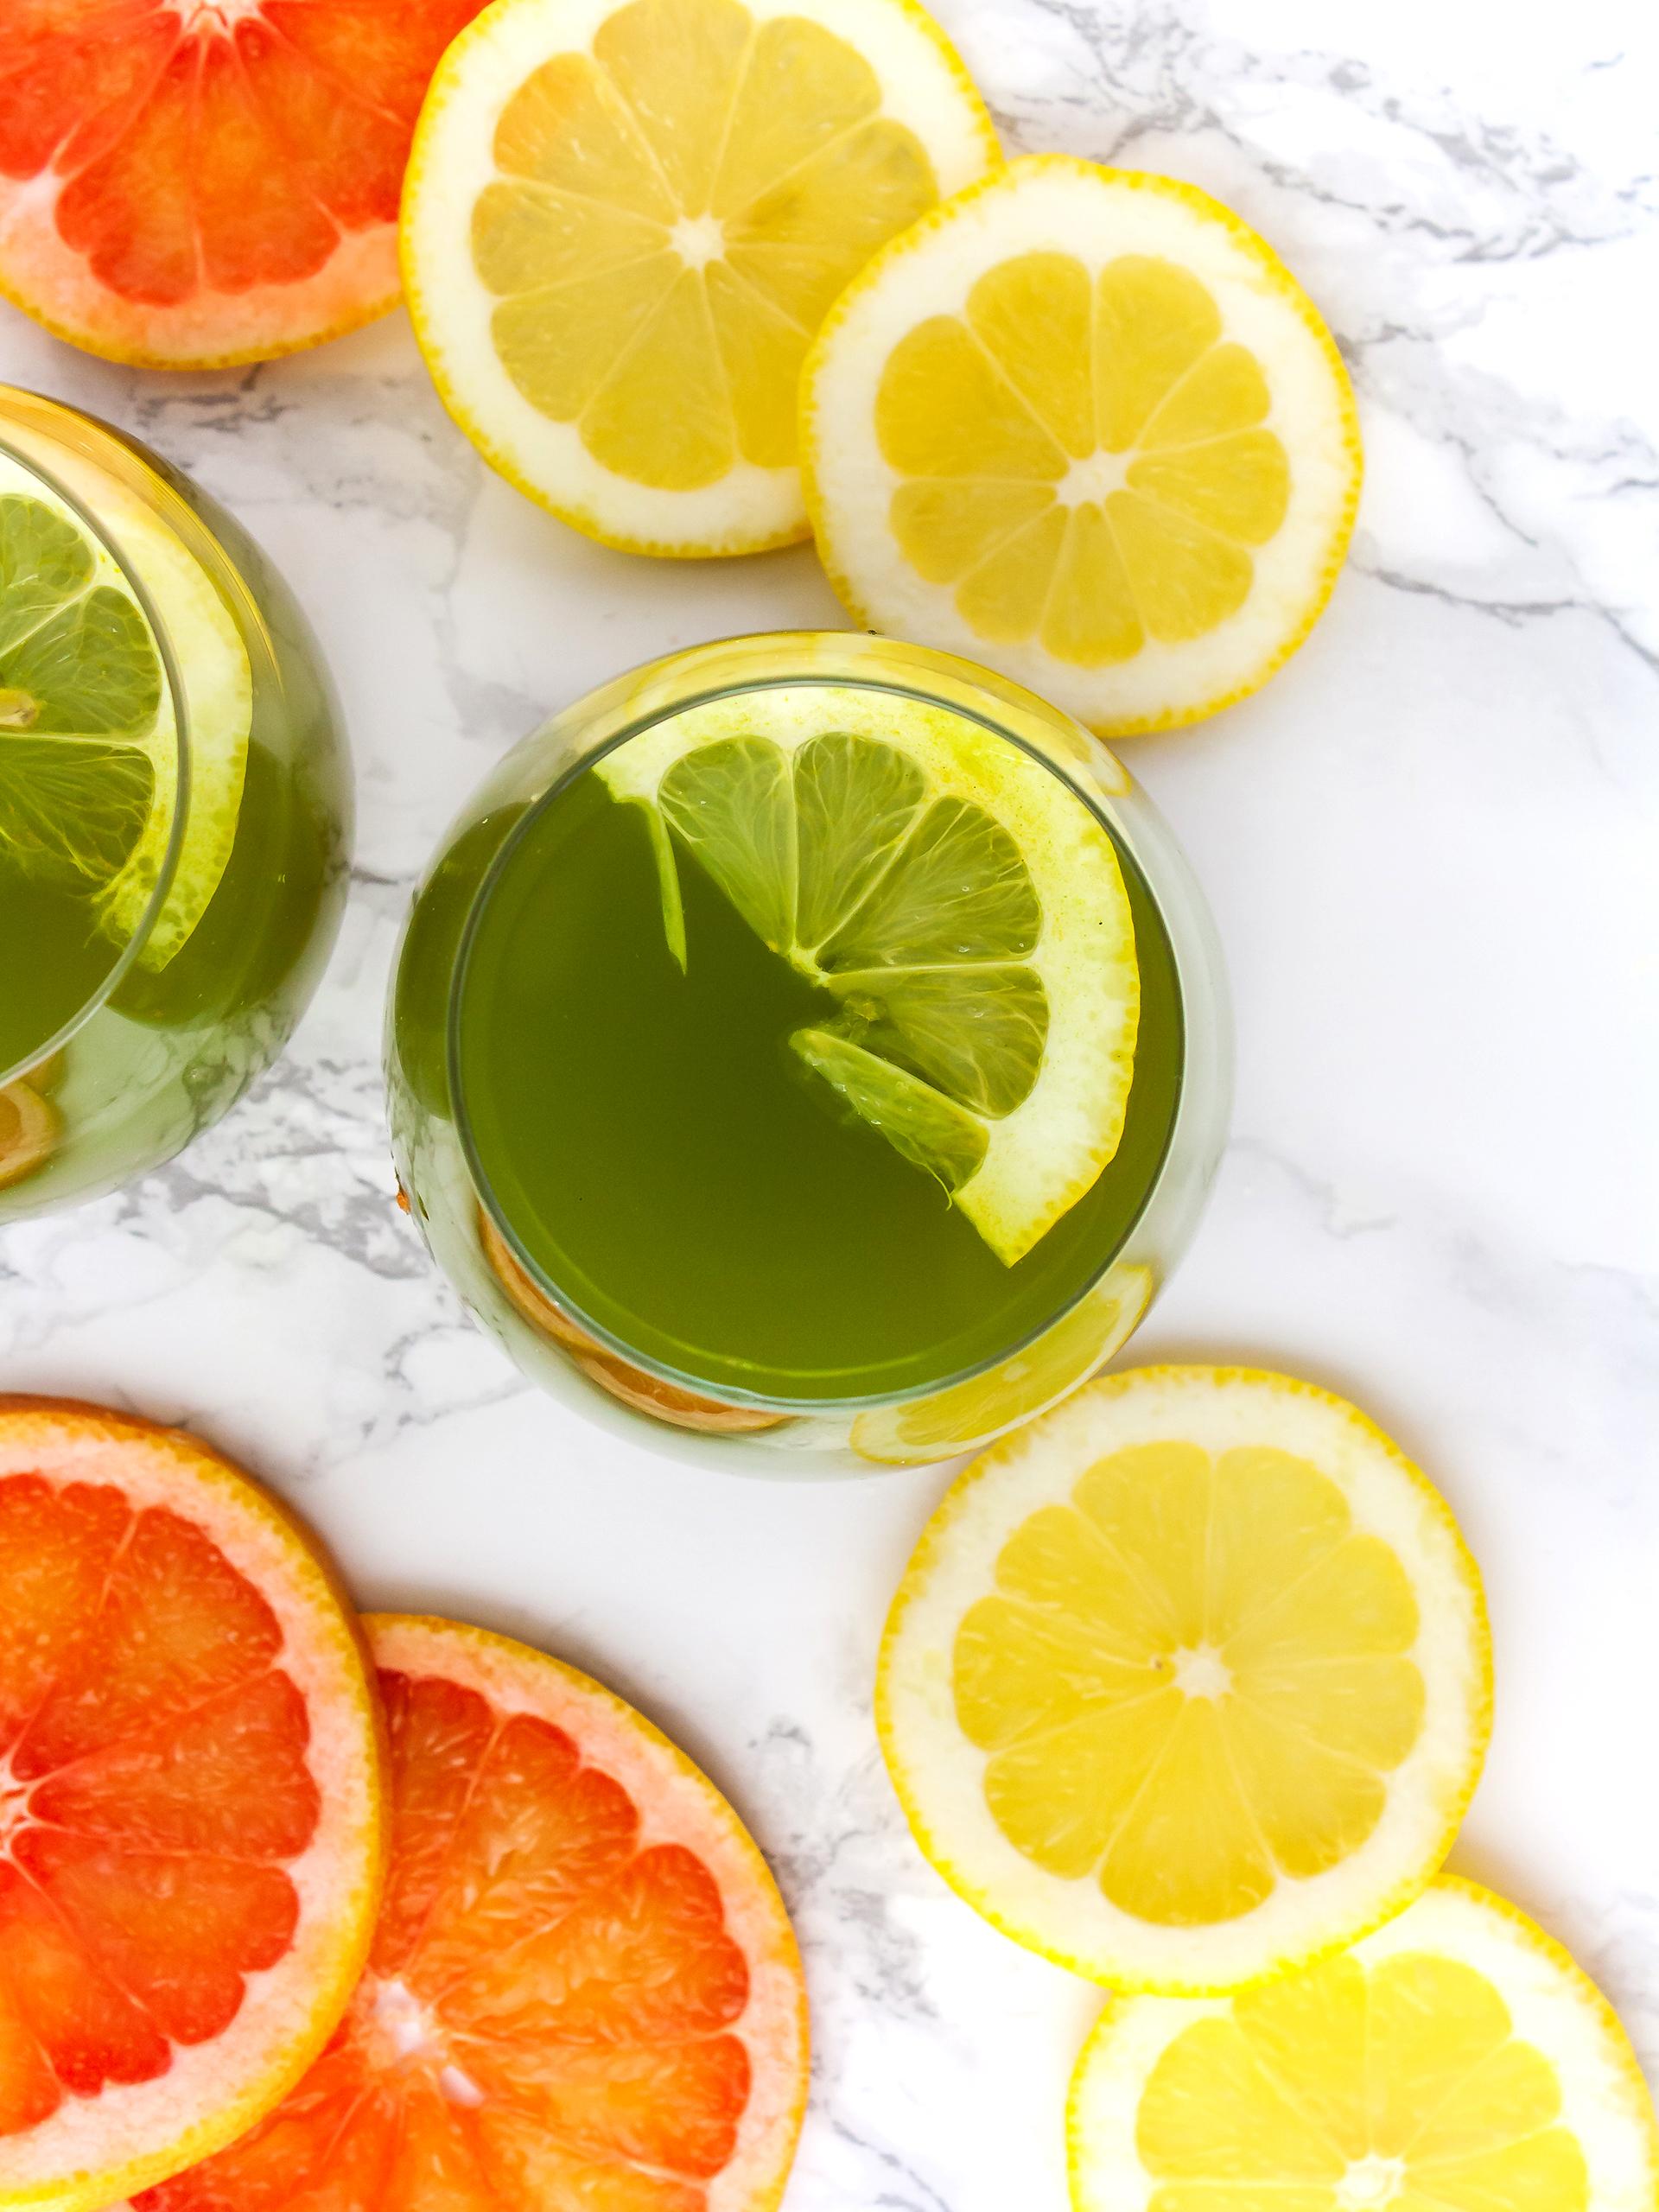 Detox Grapefruit Spirulina Lemonade with Turmeric Thumbnail